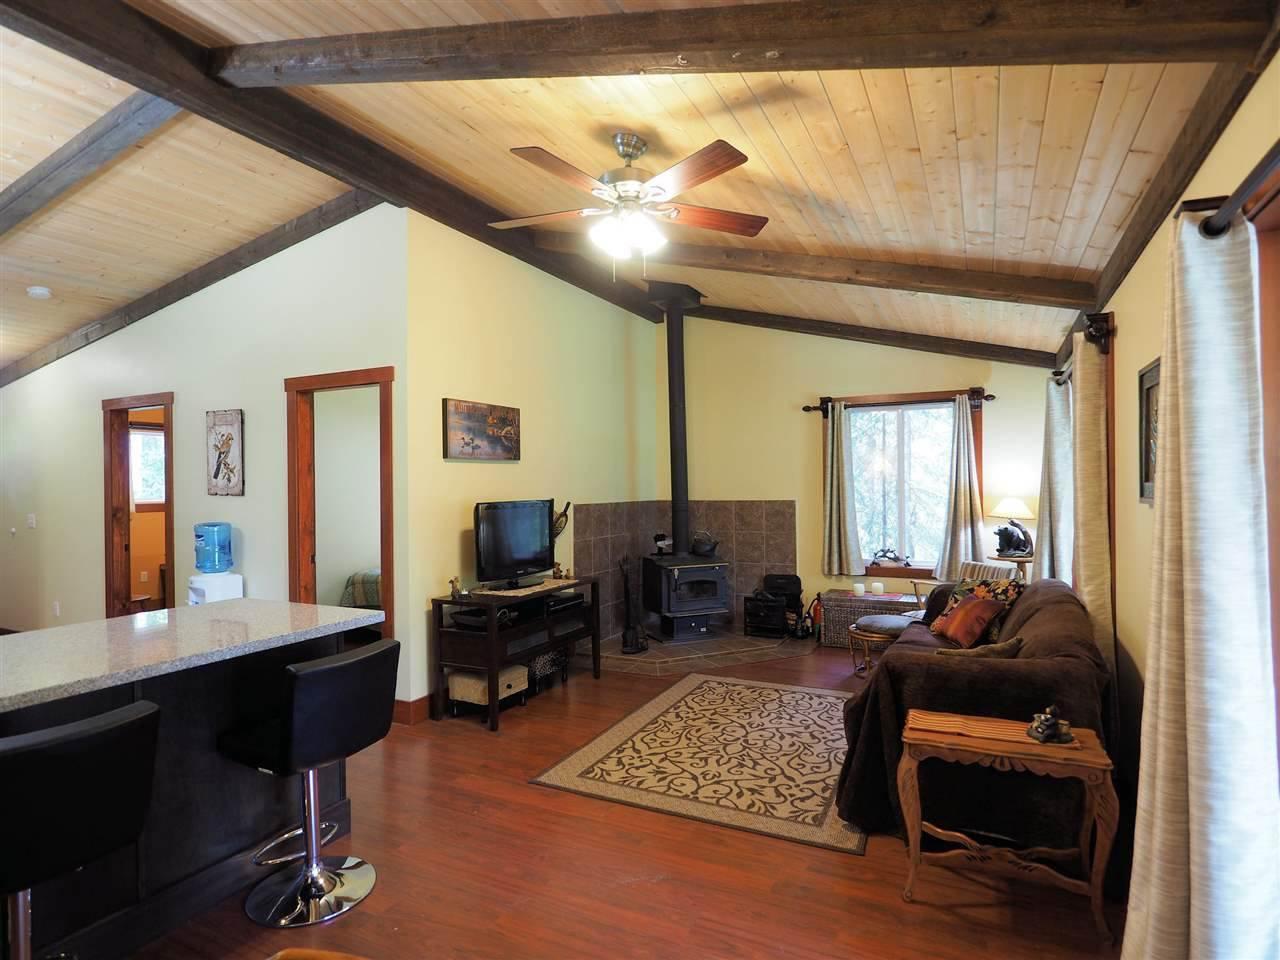 Photo 19: Photos: 8222 CENTENNIAL Road in Bridge Lake: Bridge Lake/Sheridan Lake House for sale (100 Mile House (Zone 10))  : MLS®# R2457362